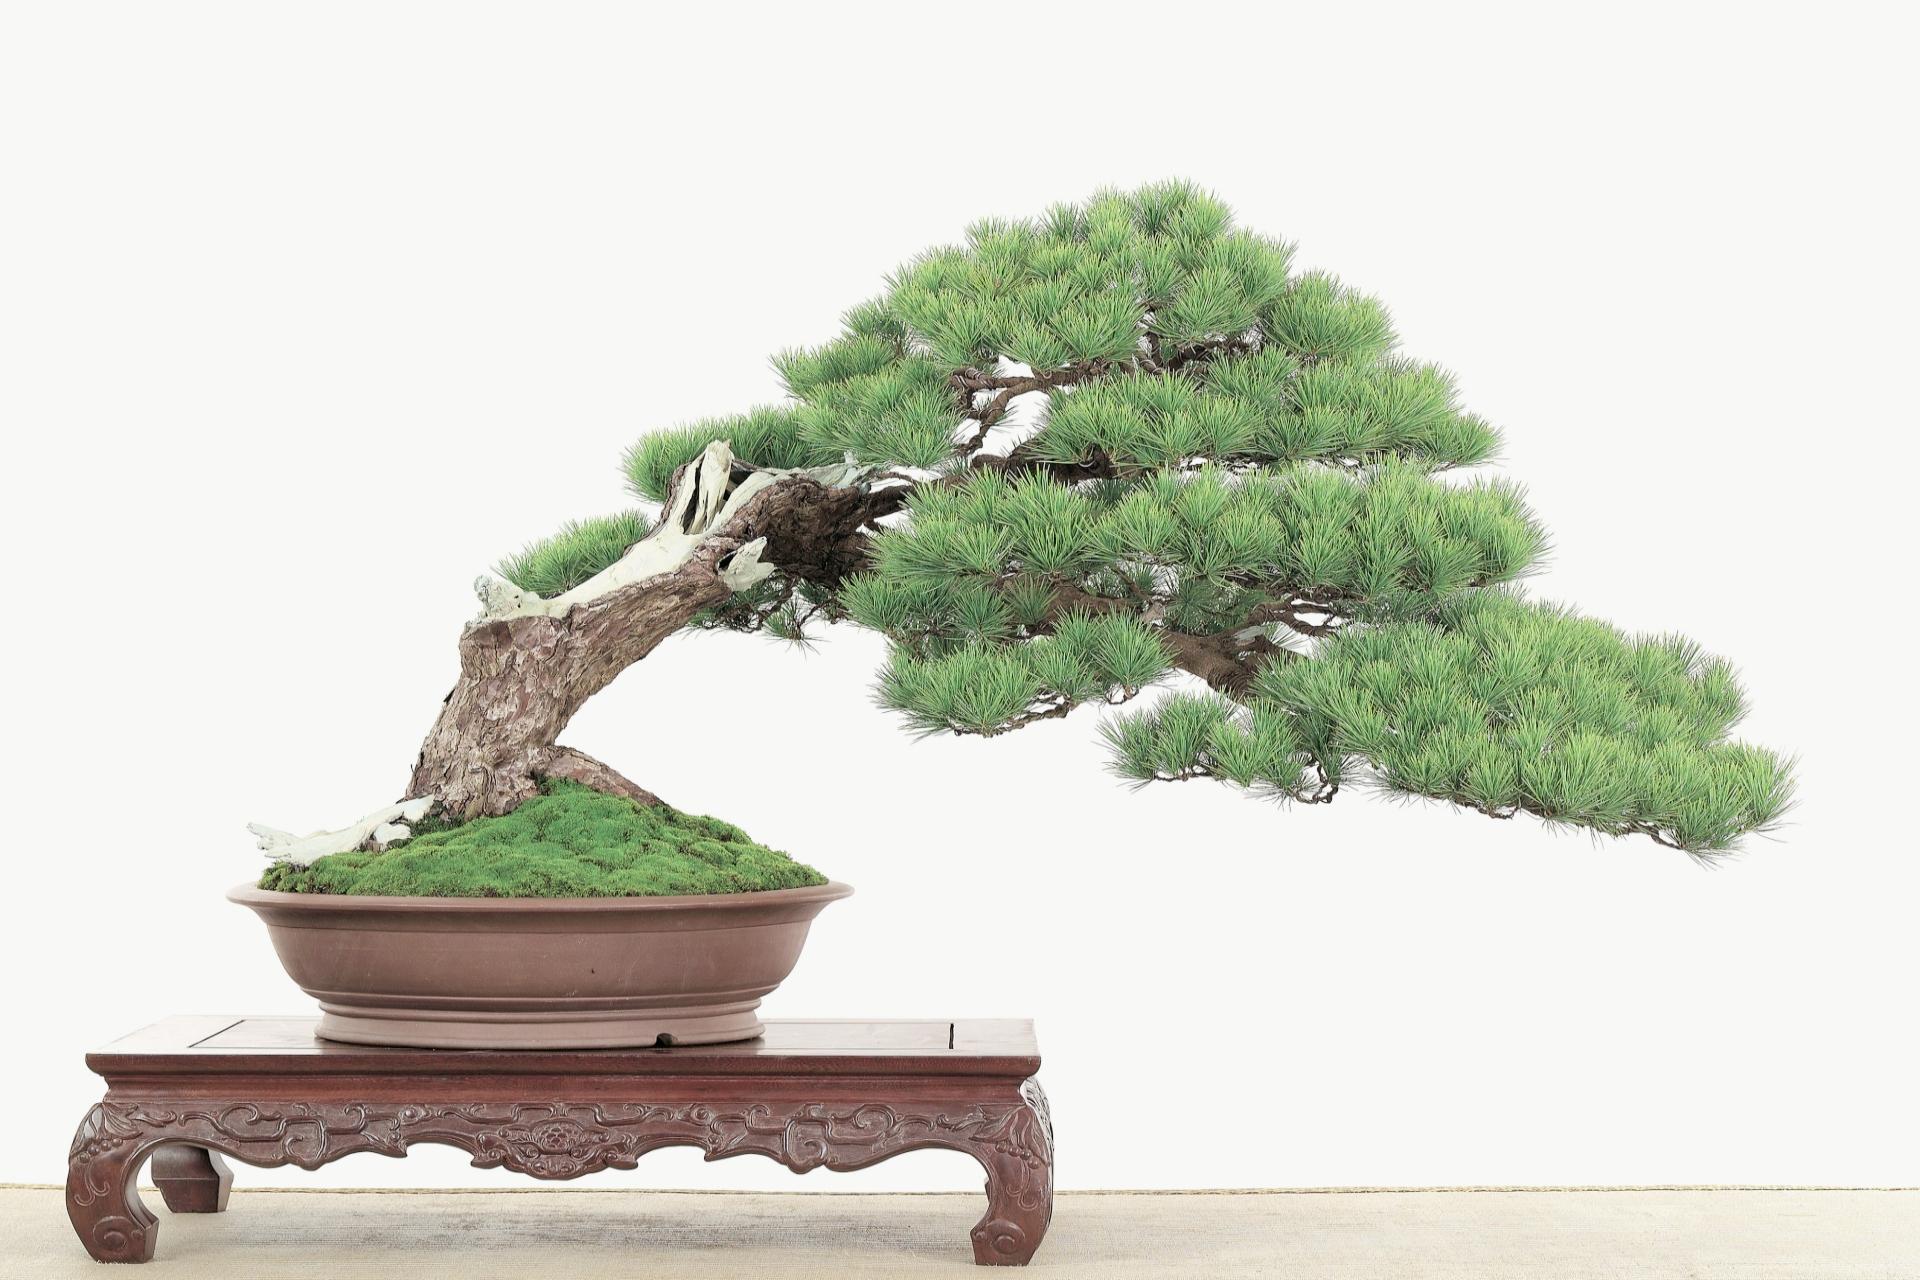 BONSAI - Appreciate bonsai grooming with Houston Bonsai Society - Sat./Sun. @ Japanese Gardens